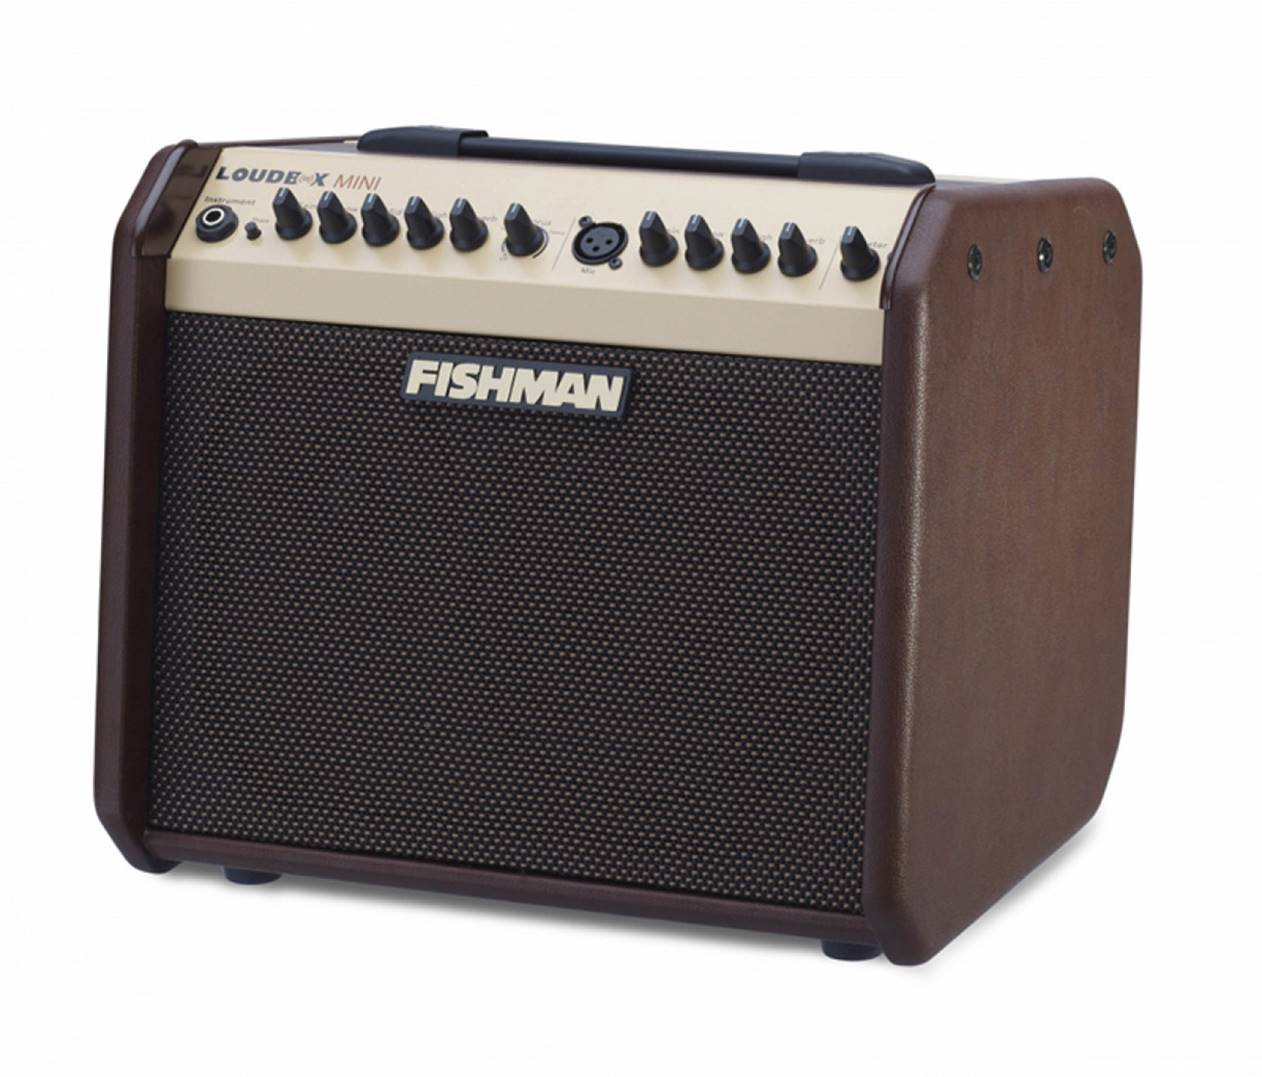 Fishman Loudbox 60W Guitar Amp